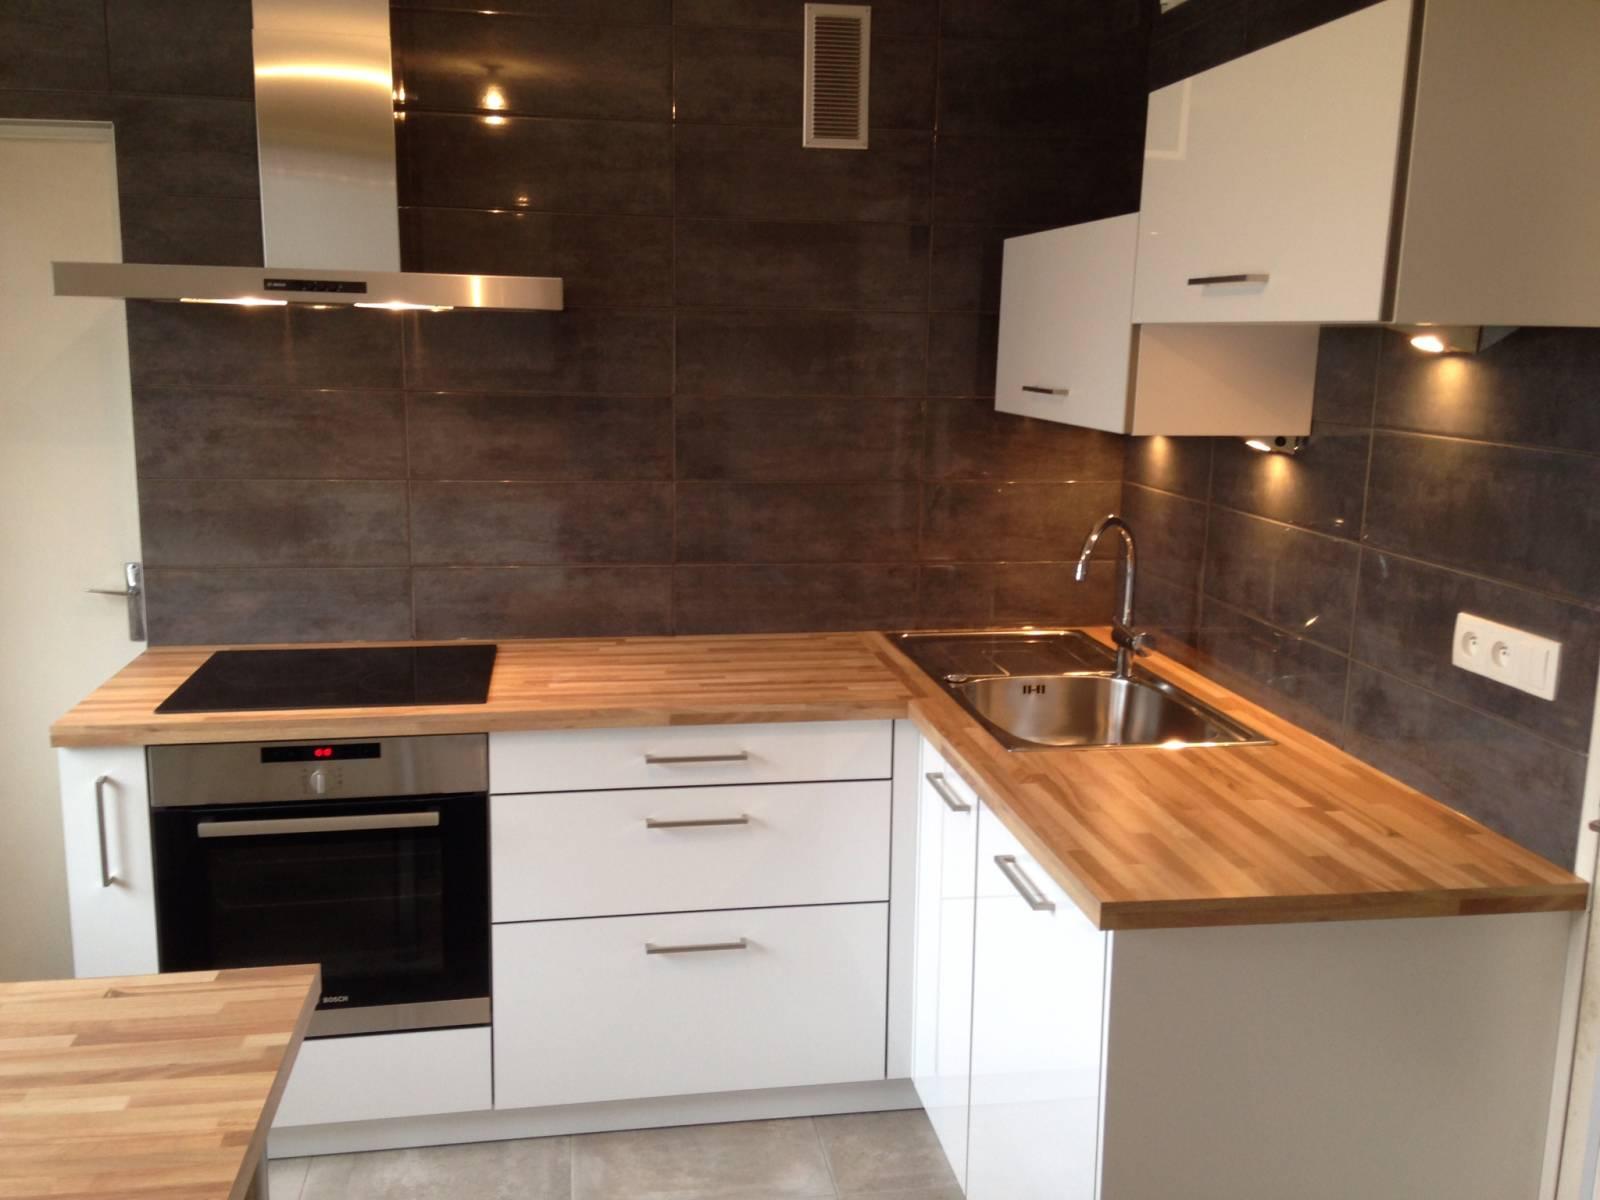 prix cuisine quip e pose comprise lyon cuisiniste. Black Bedroom Furniture Sets. Home Design Ideas